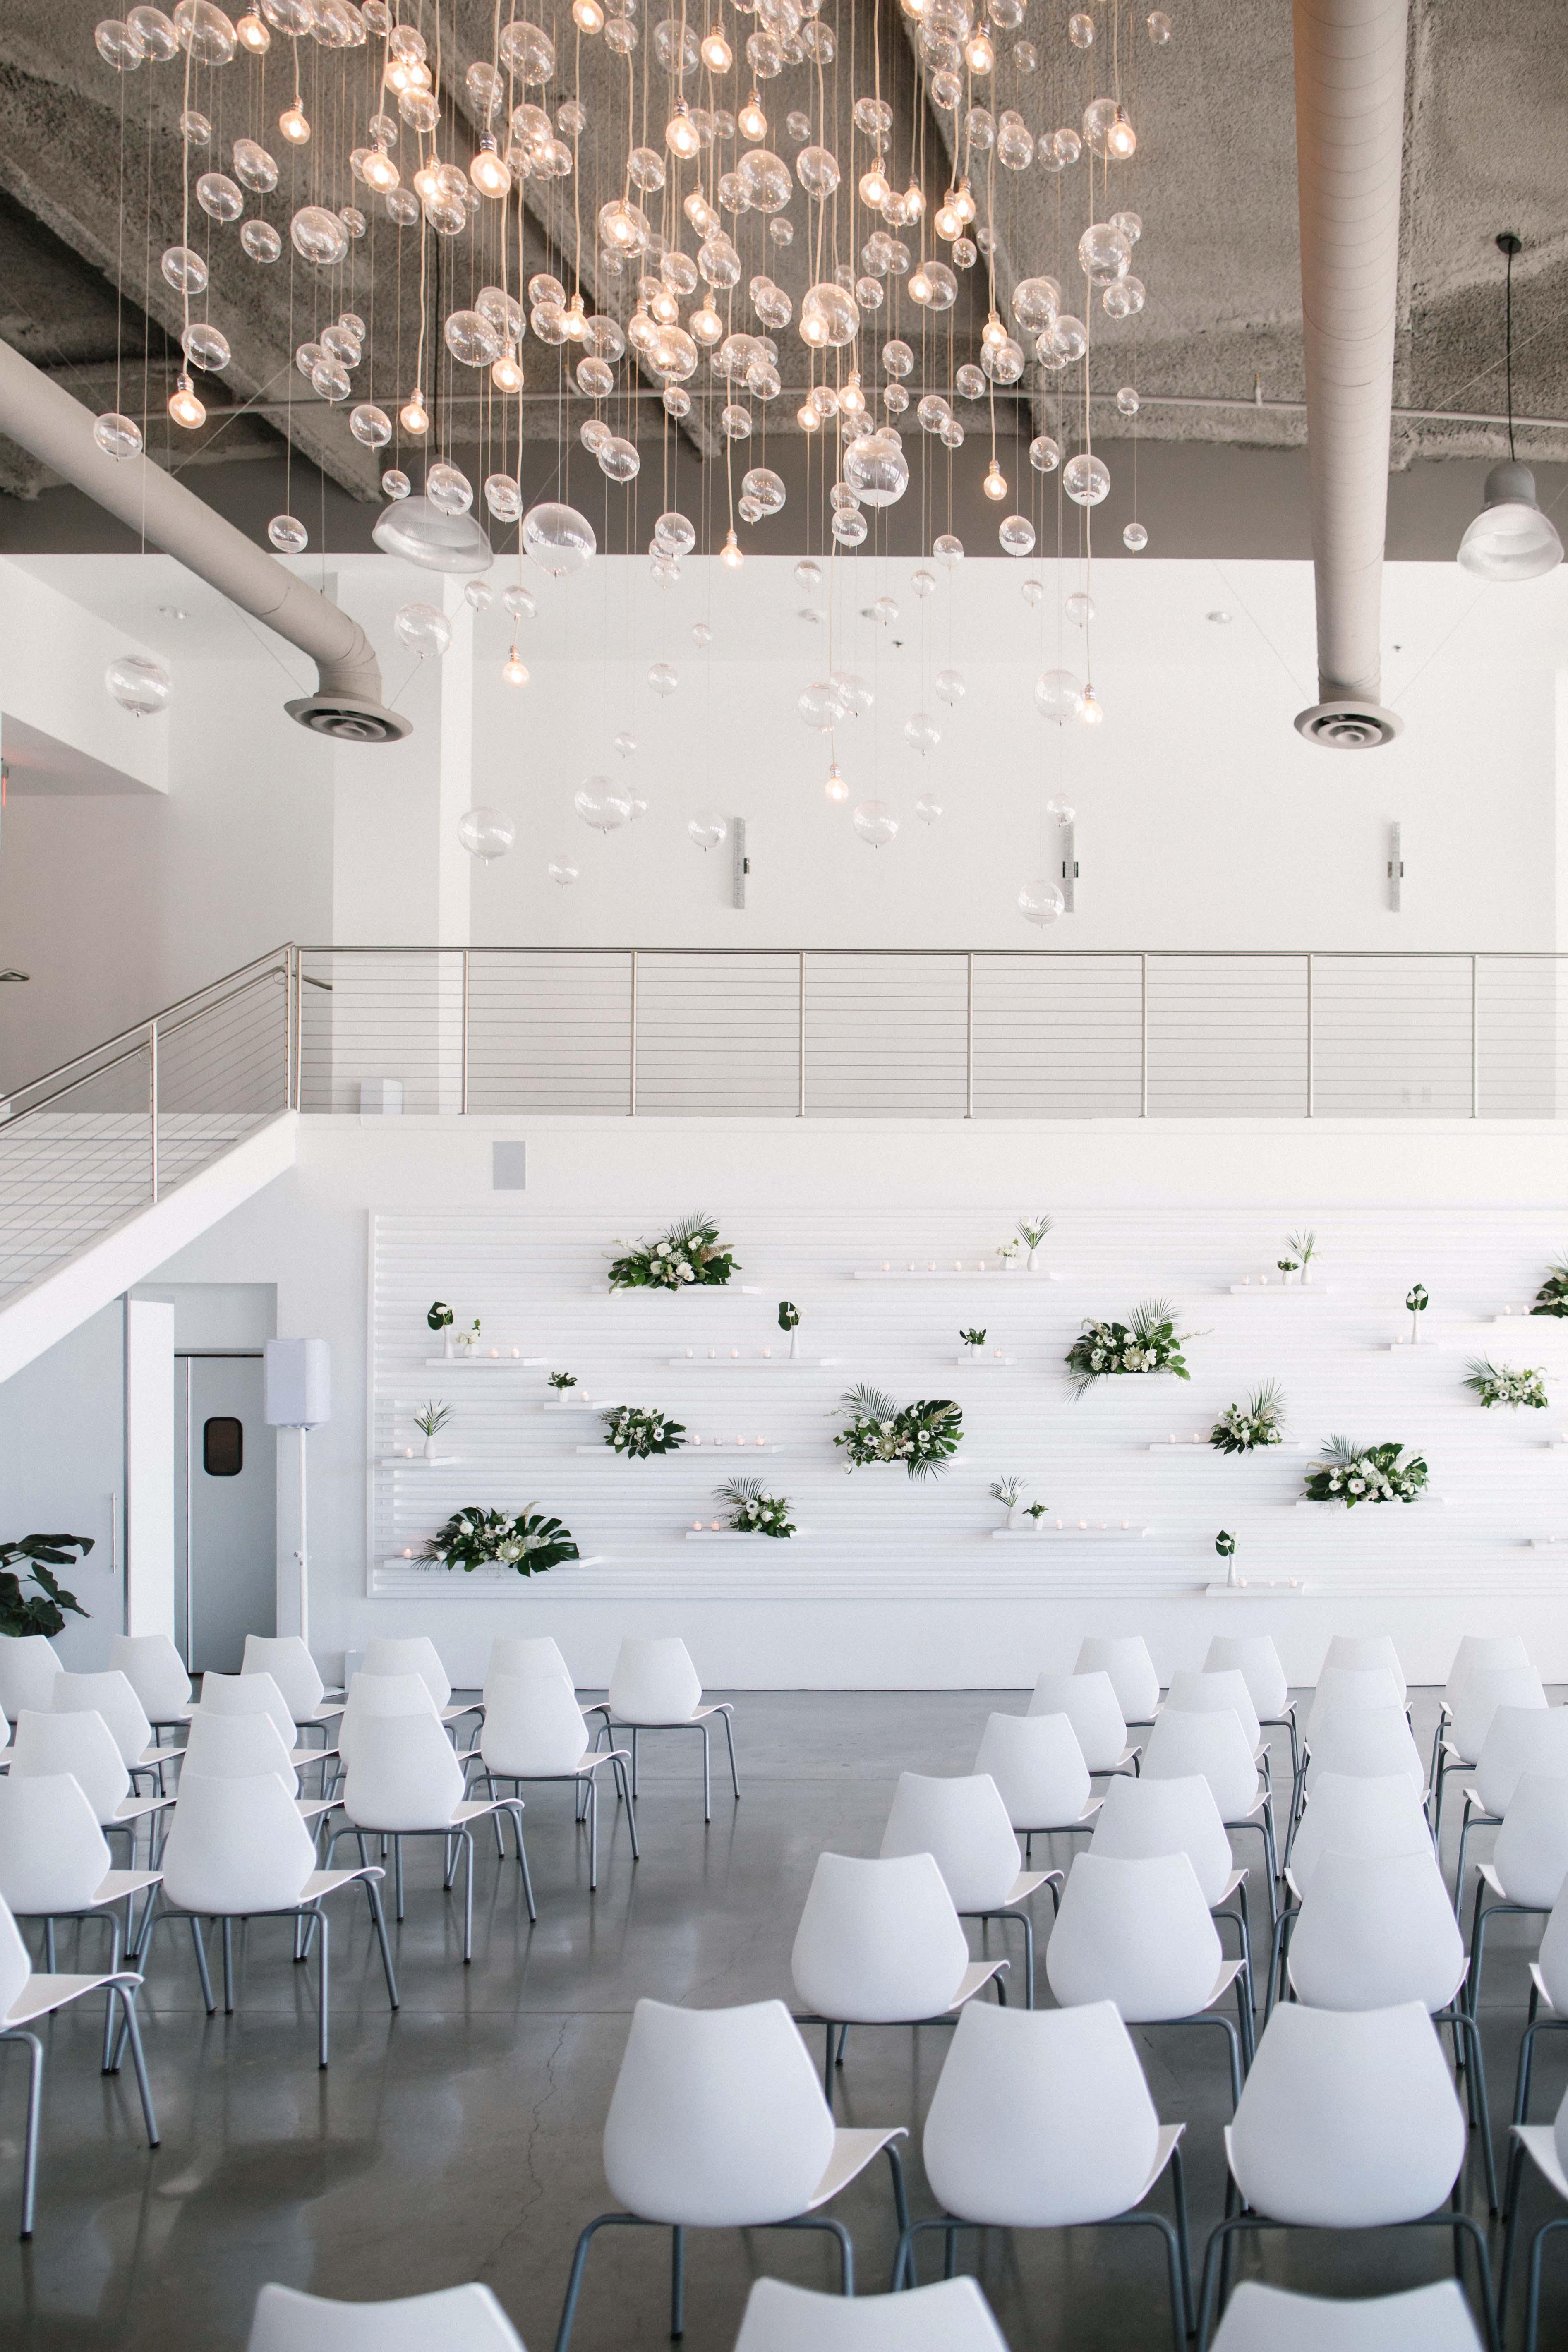 modern wedding seating arrangement